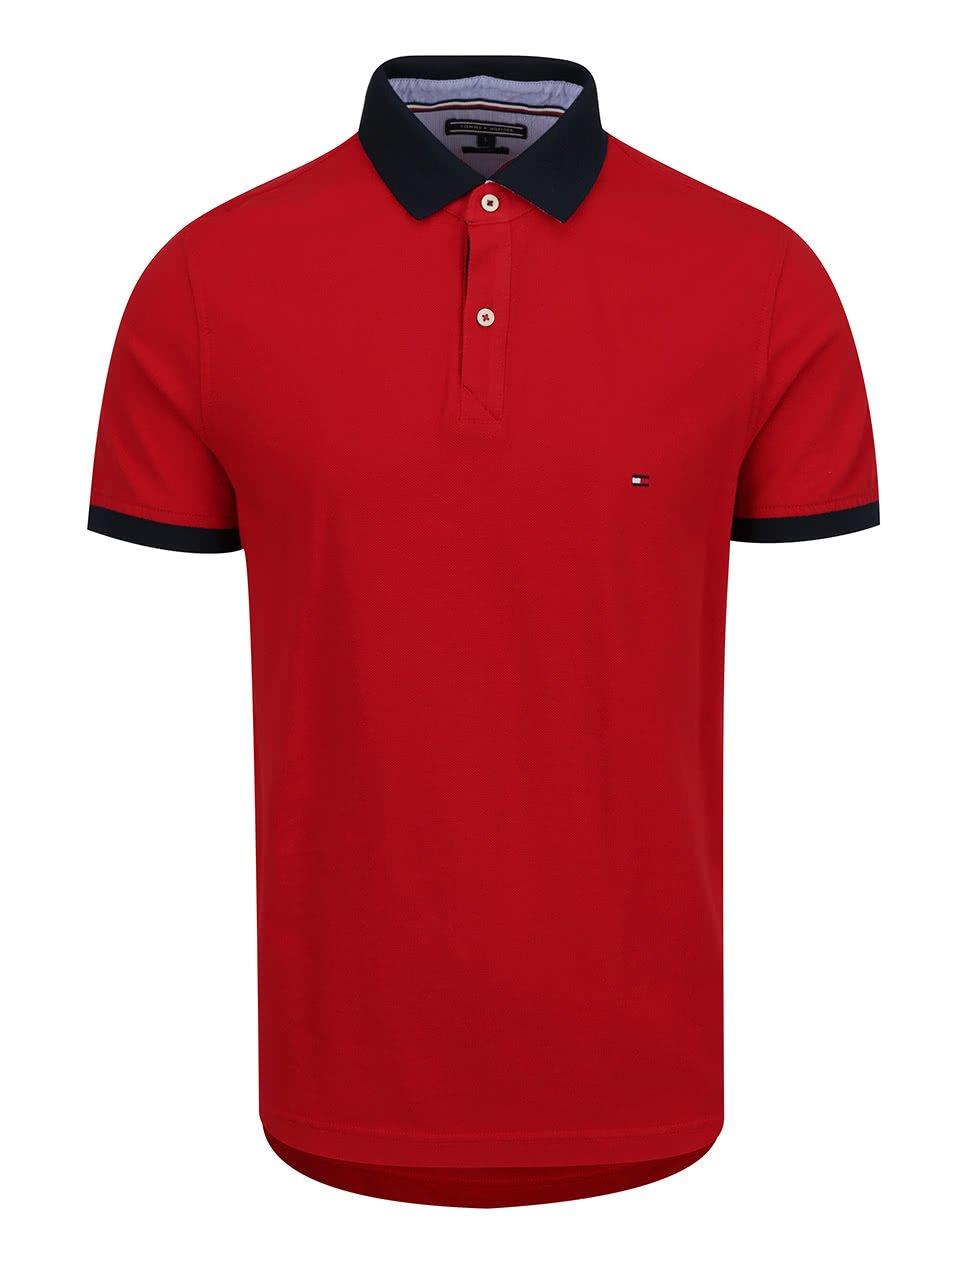 Červené pánské polo triko s modrým límcem Tommy Hilfiger